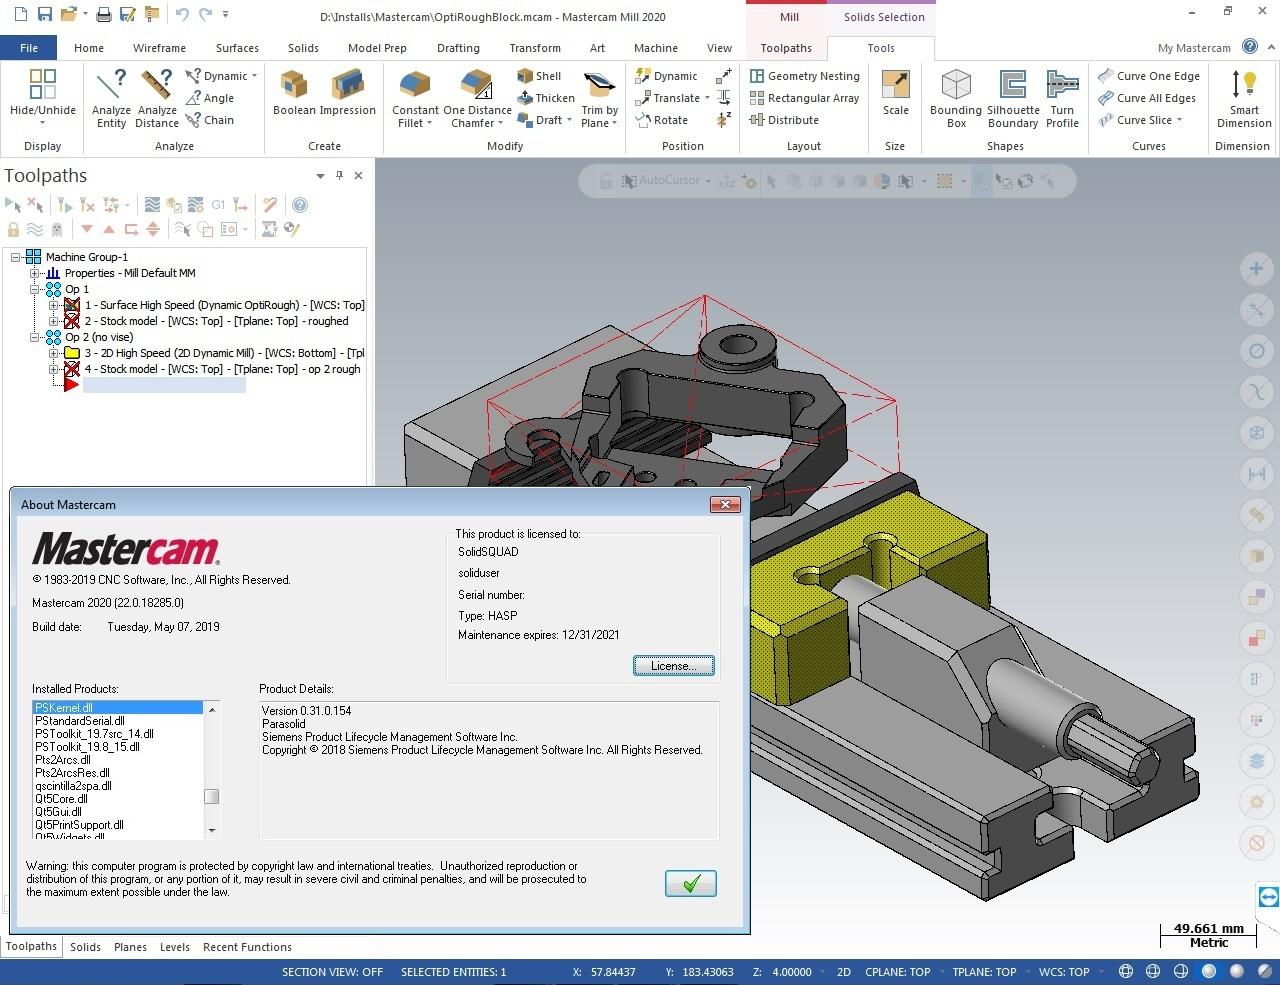 Programming with Mastercam 2020 (v22.0.18285.0) Win64 full license